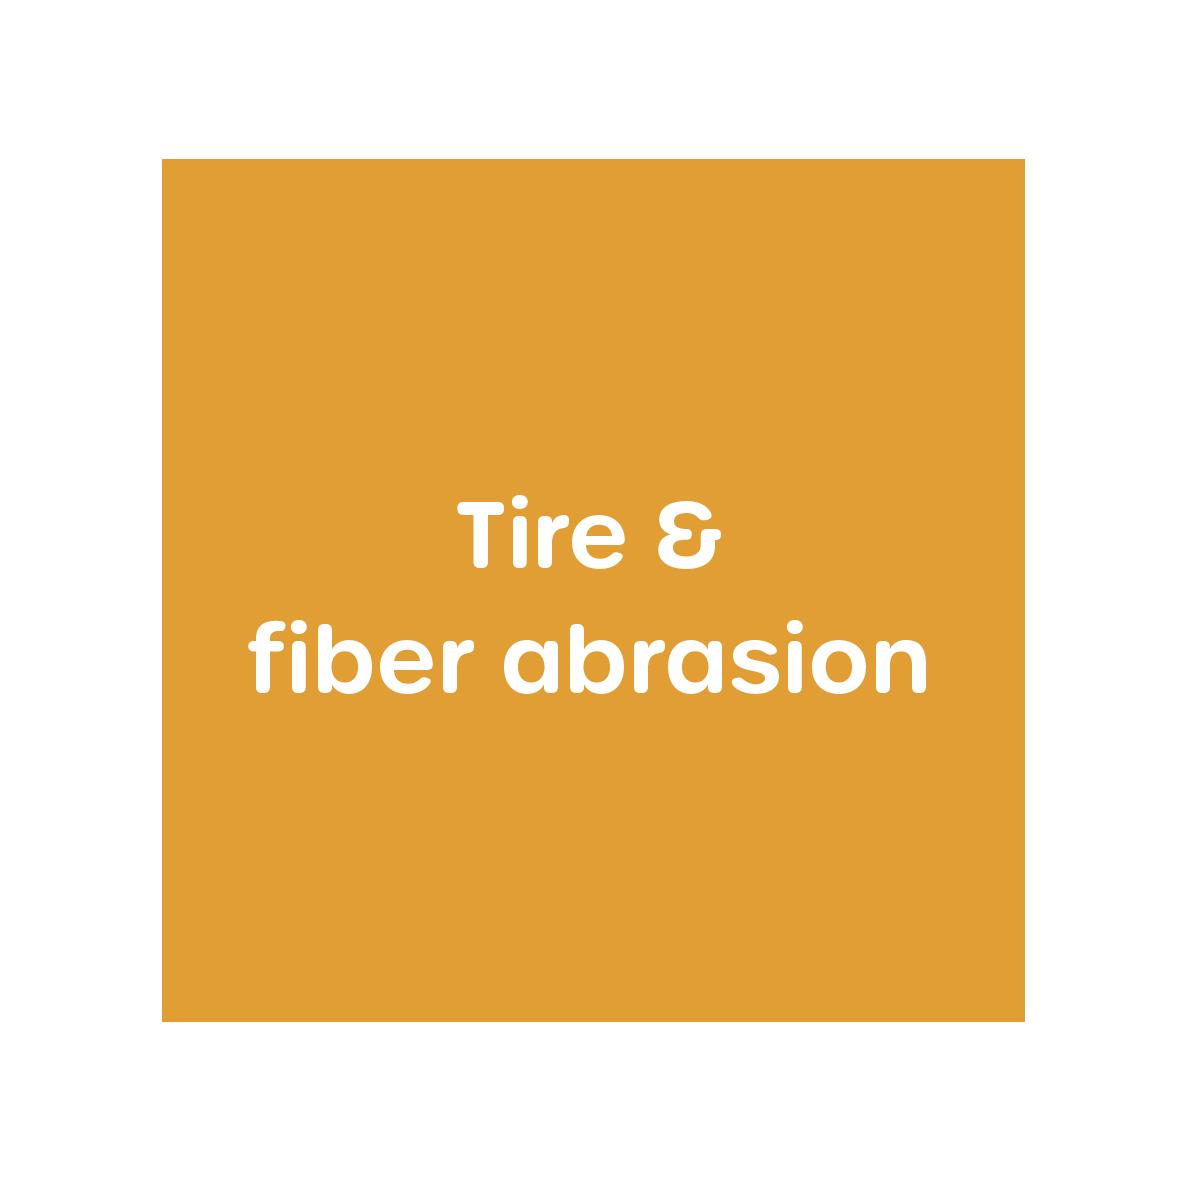 Abrasion - abrasive particles